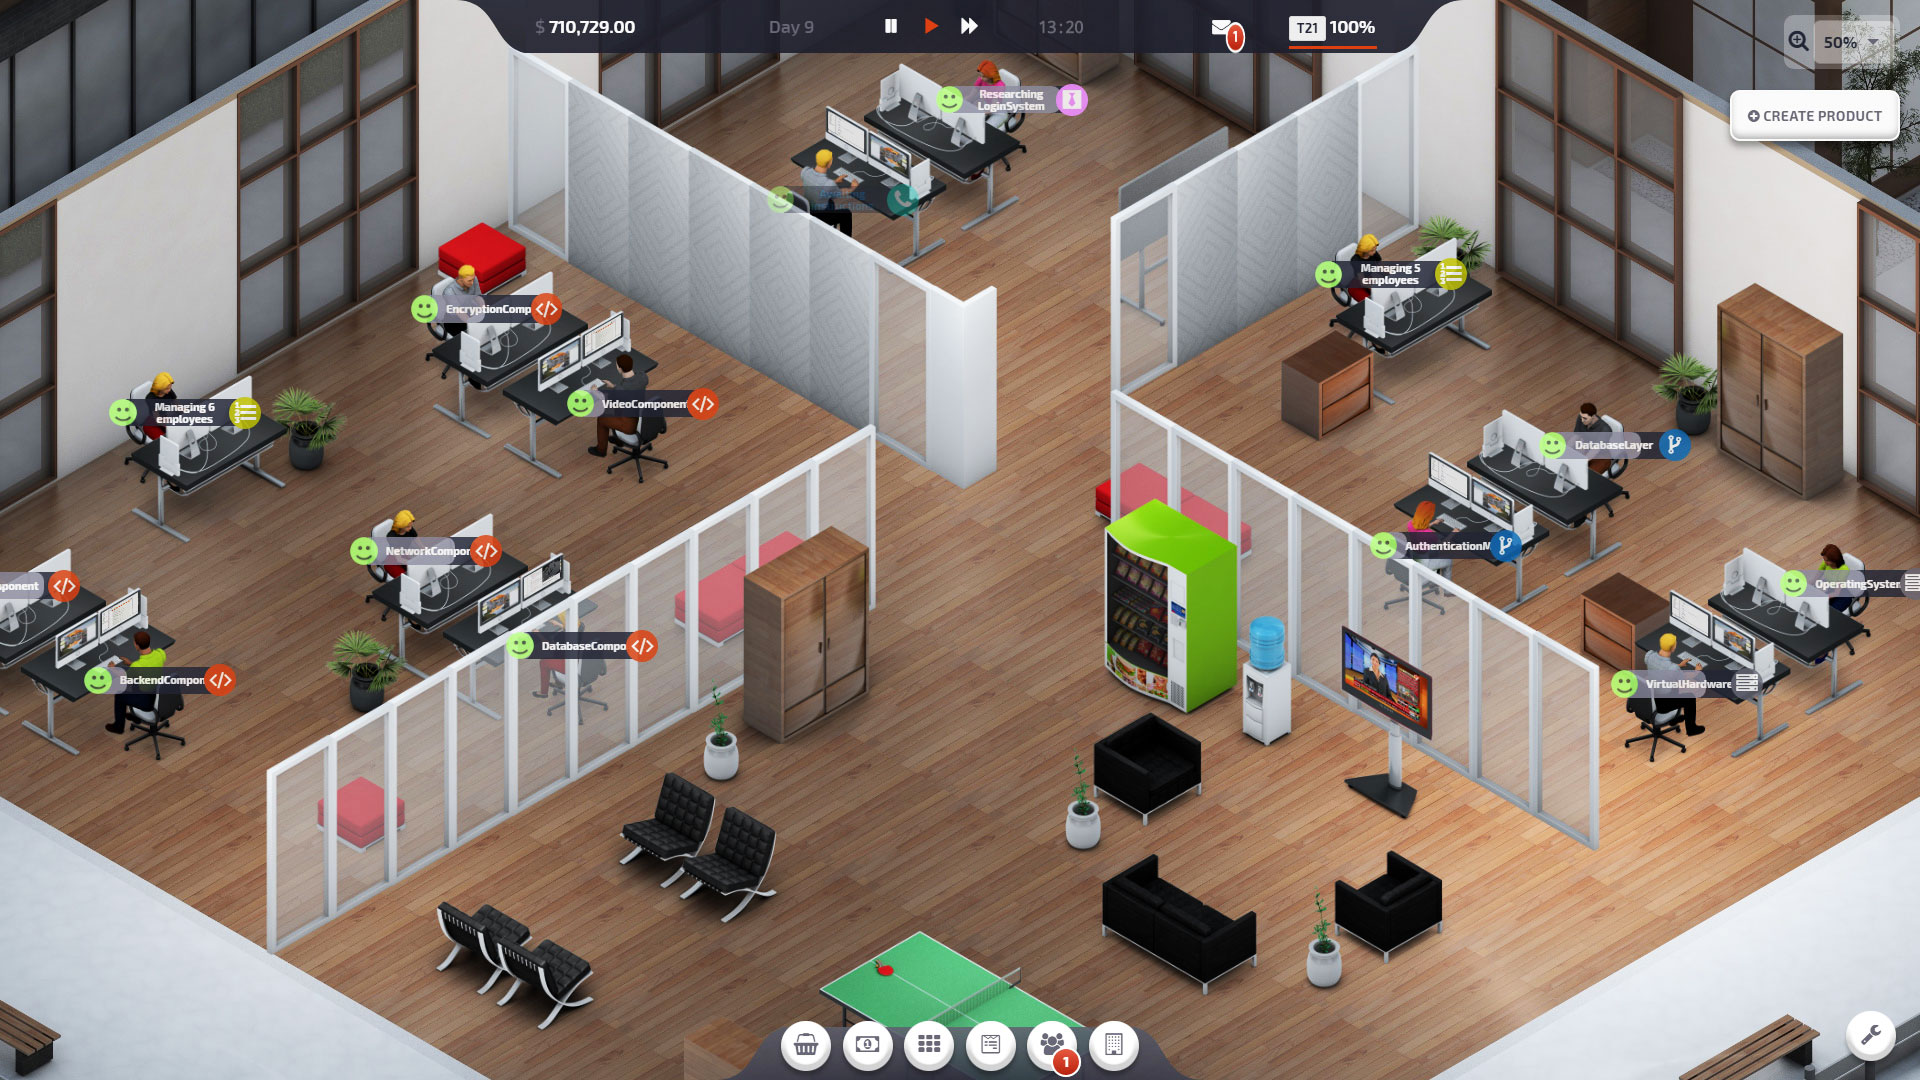 Startup Company Screenshot 1